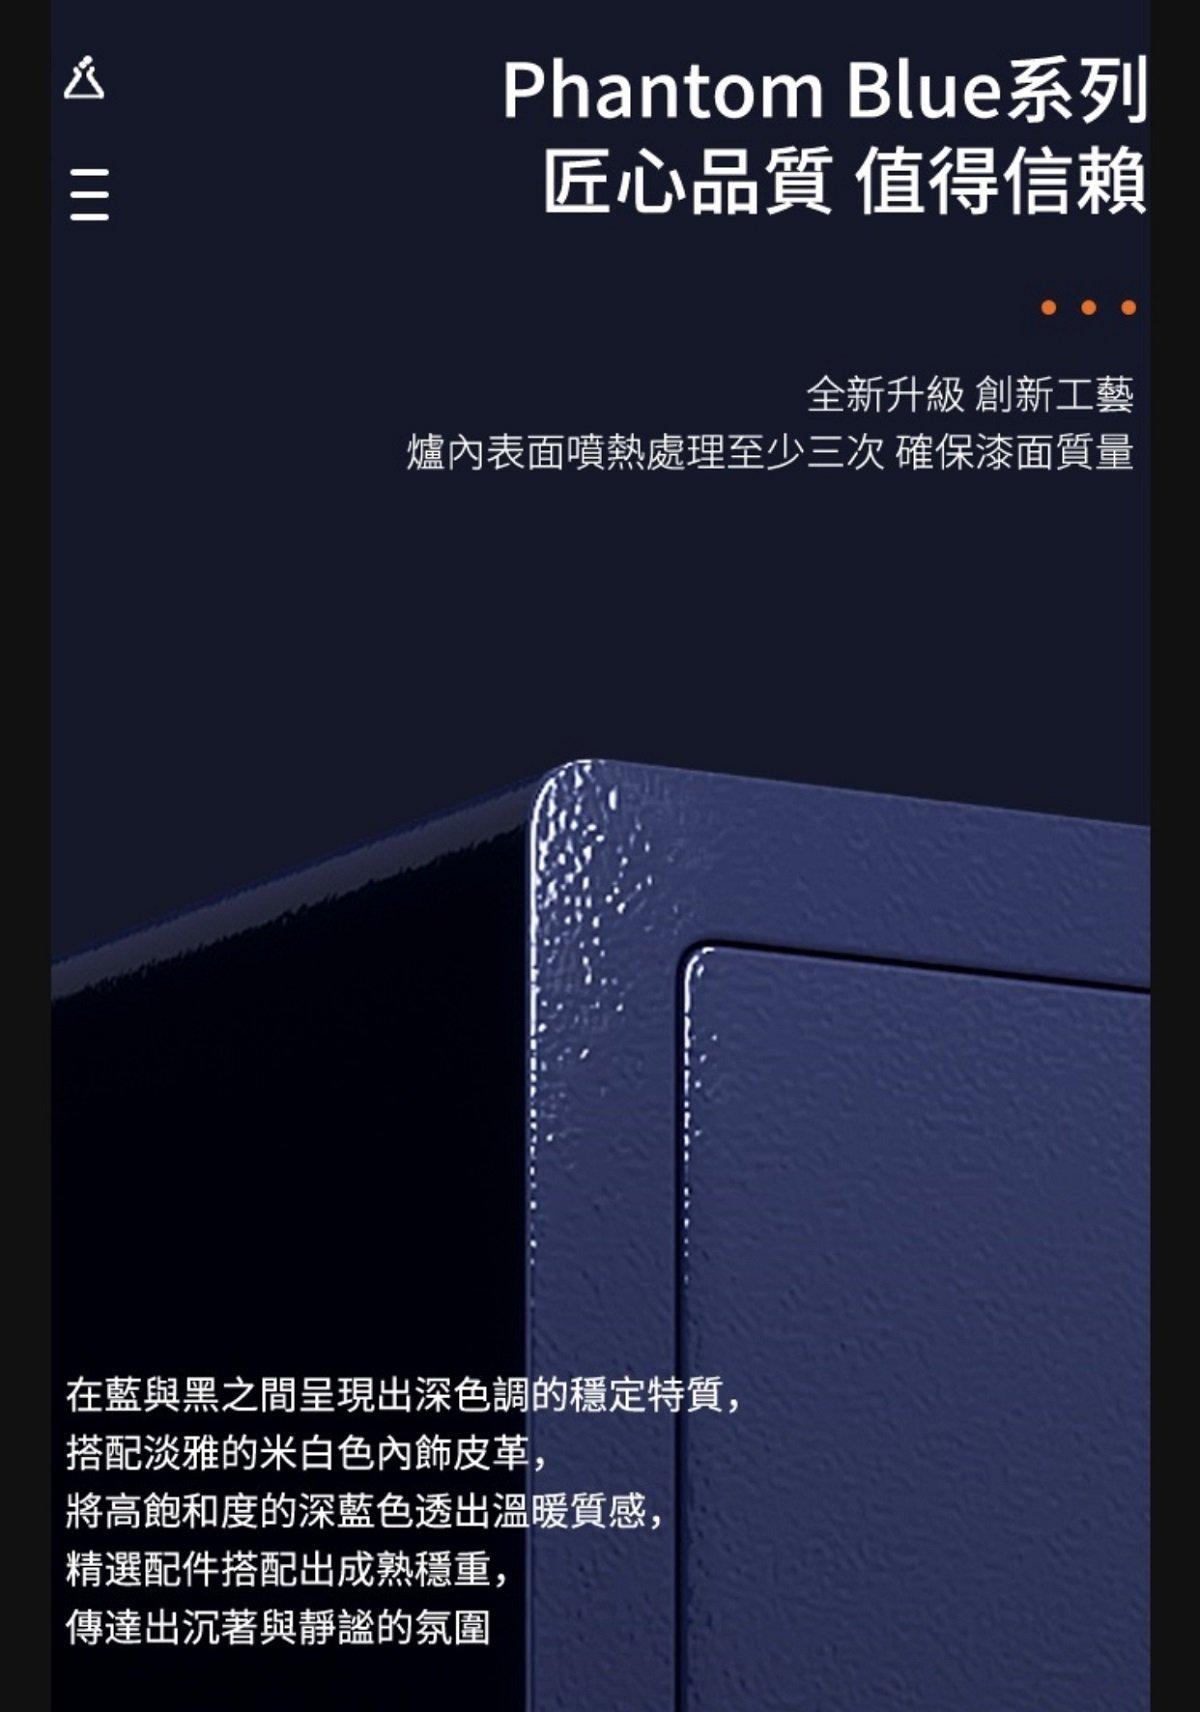 Marketing graphic-PB45-11